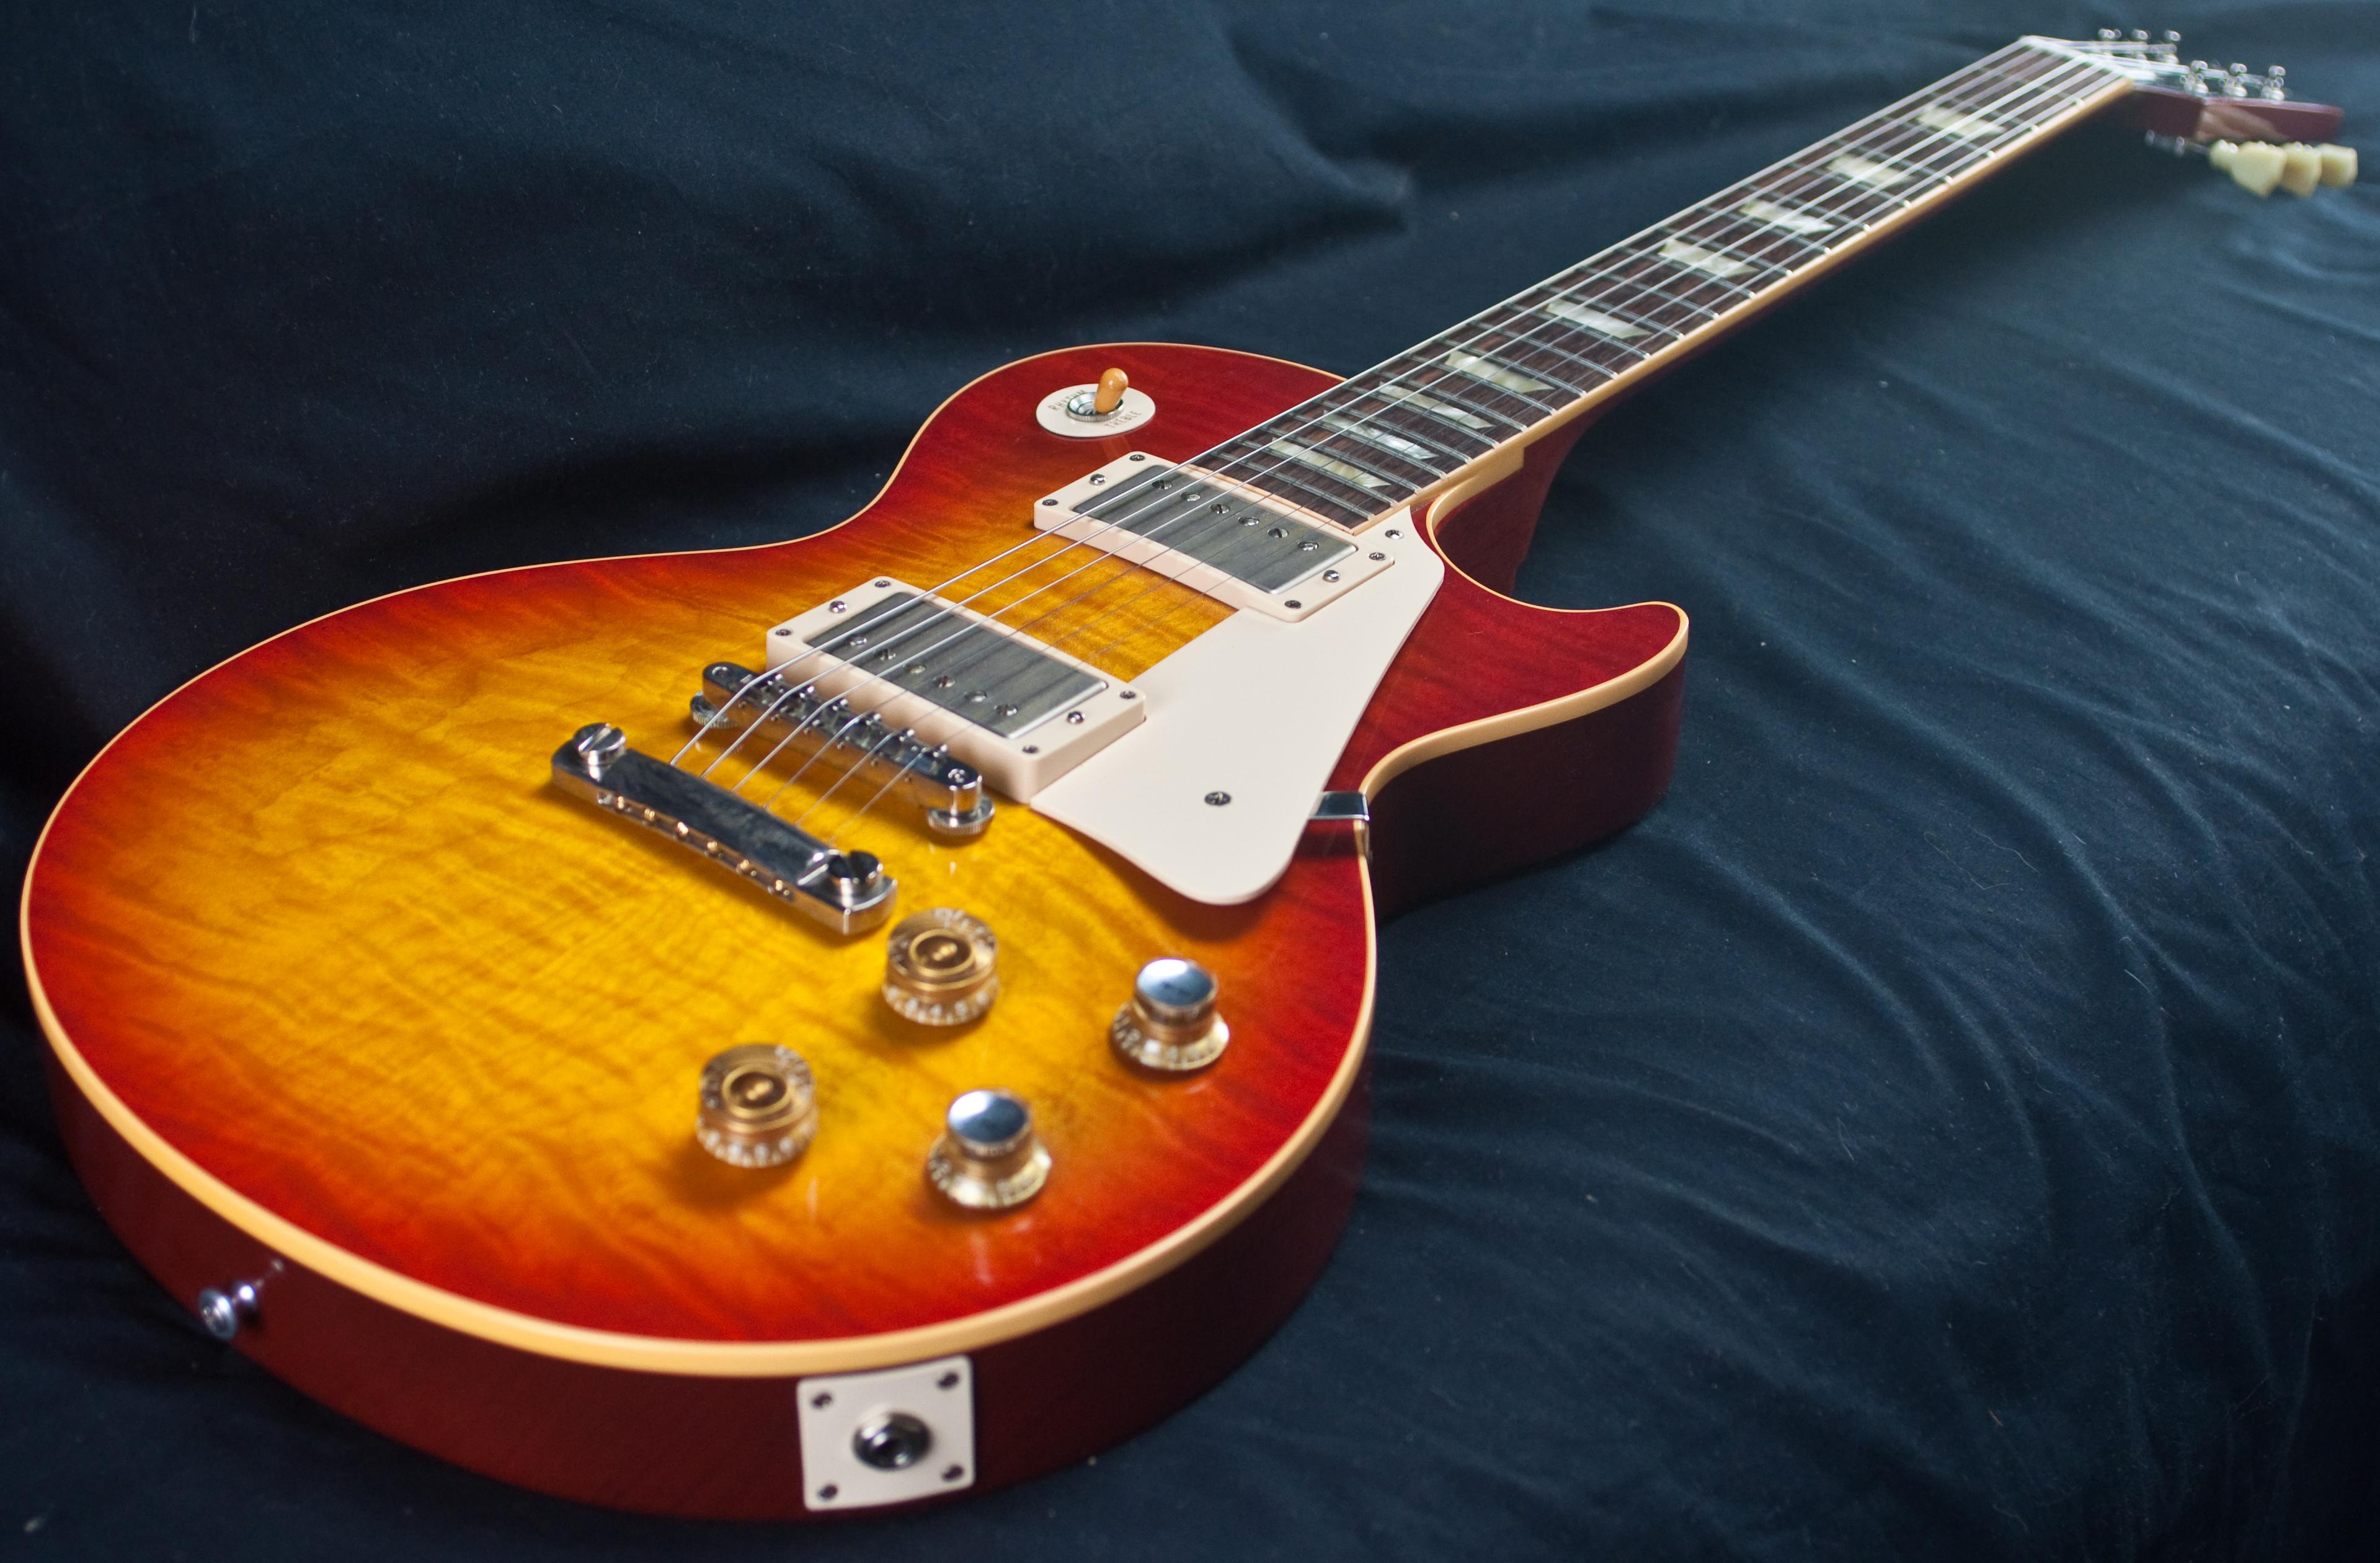 gibson les paul custom shop 60 39 s reissue guitar used. Black Bedroom Furniture Sets. Home Design Ideas